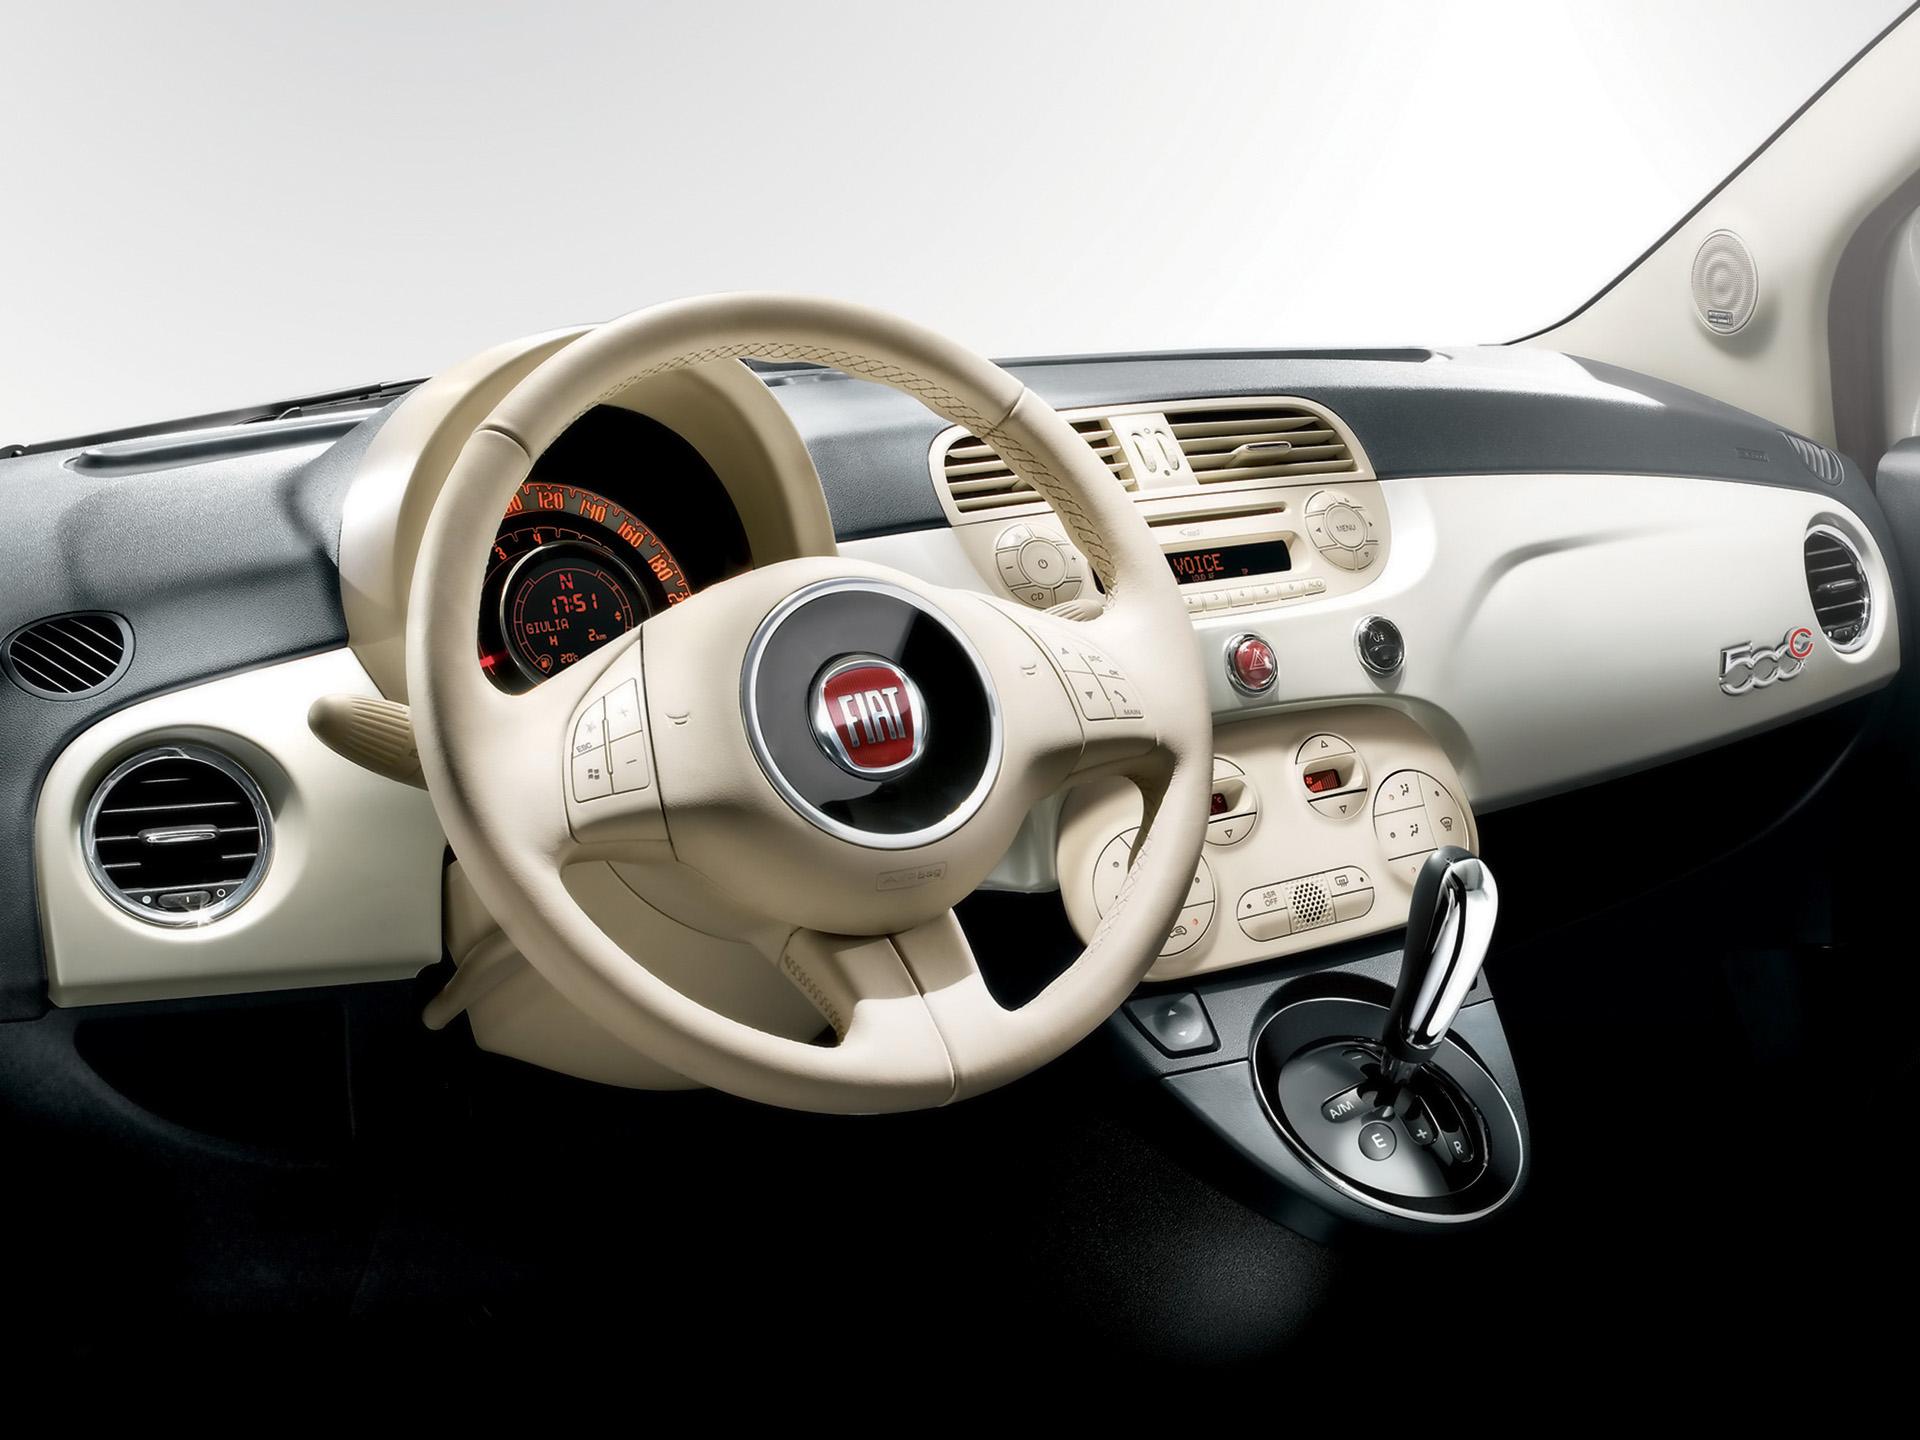 Fiat Interior Wallpaper